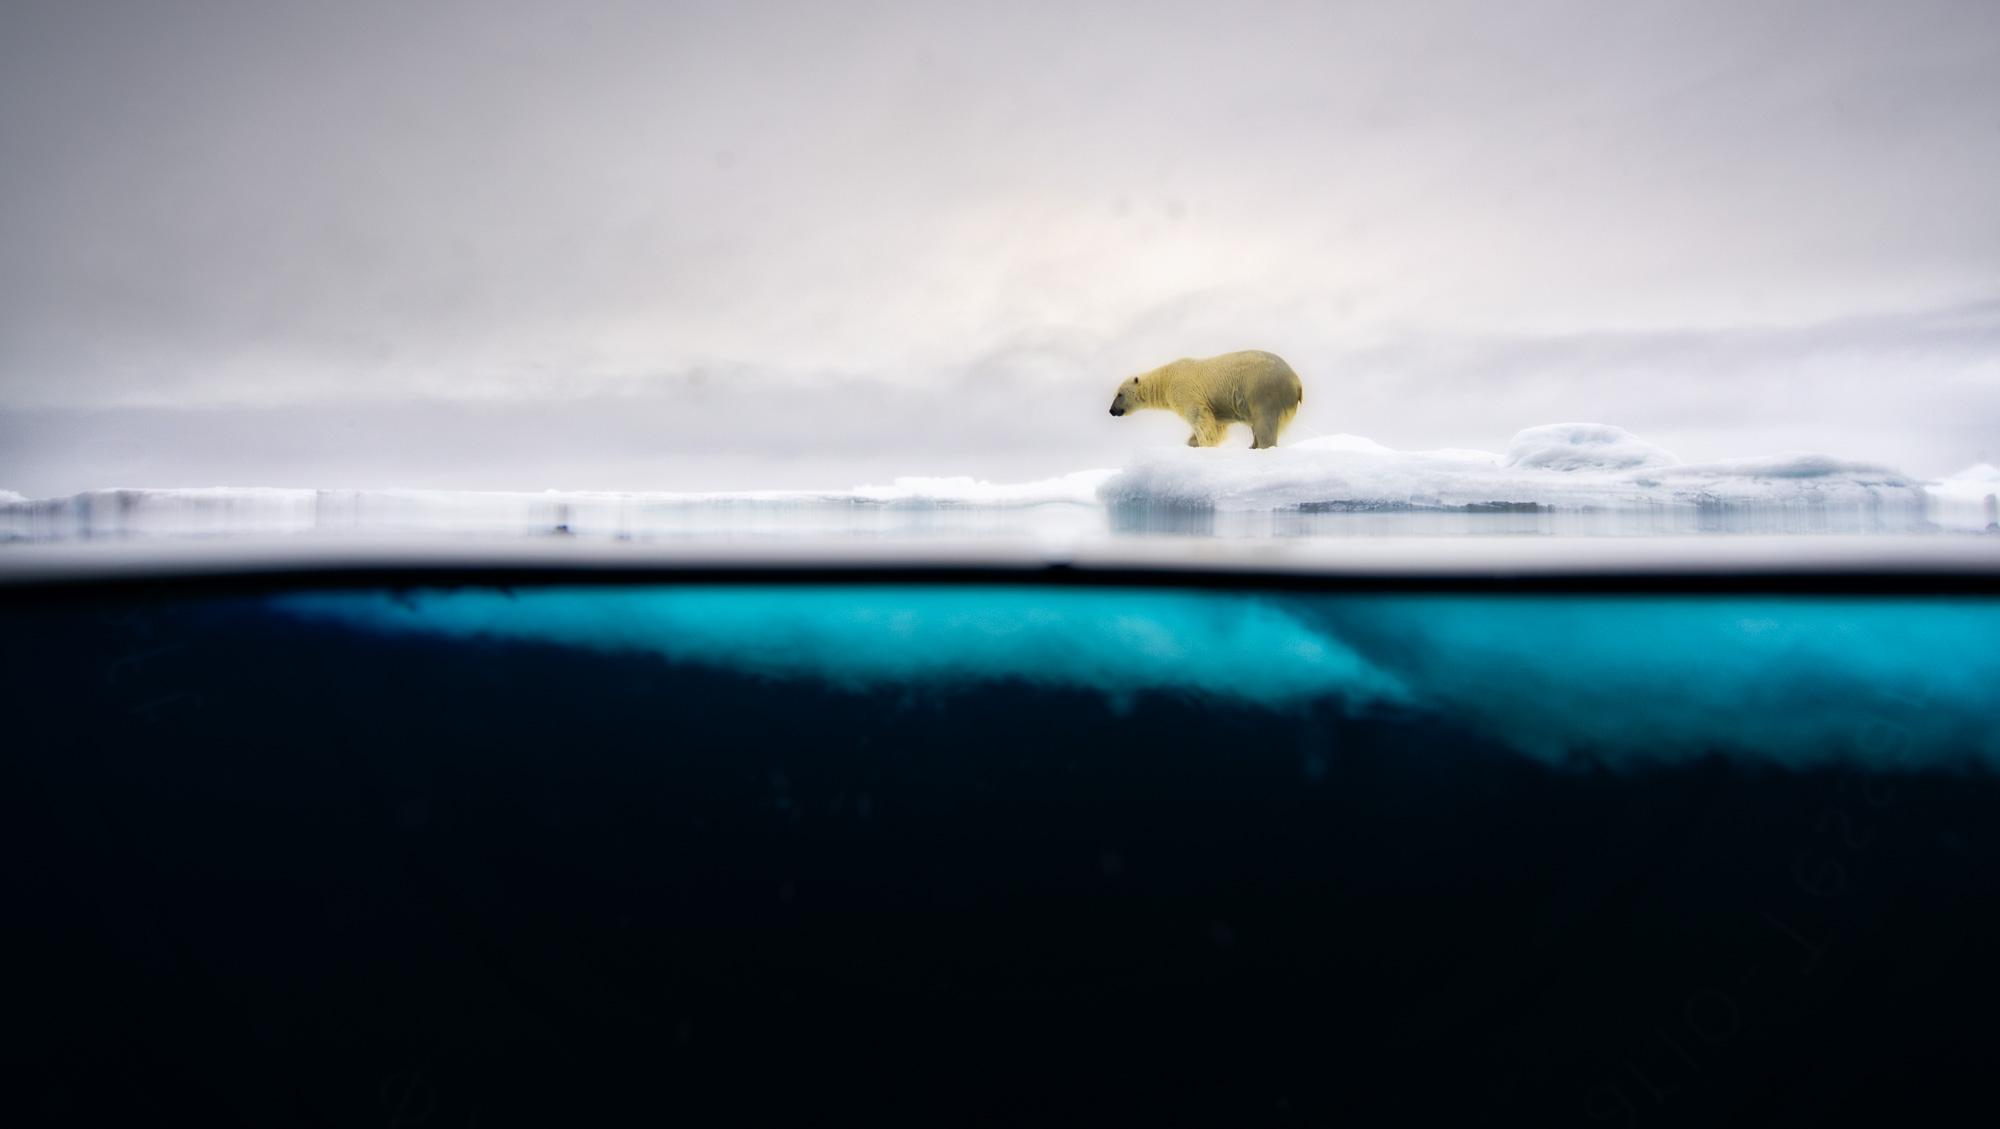 Copyright: Polar Bears & Humans project / Ole J Liodden